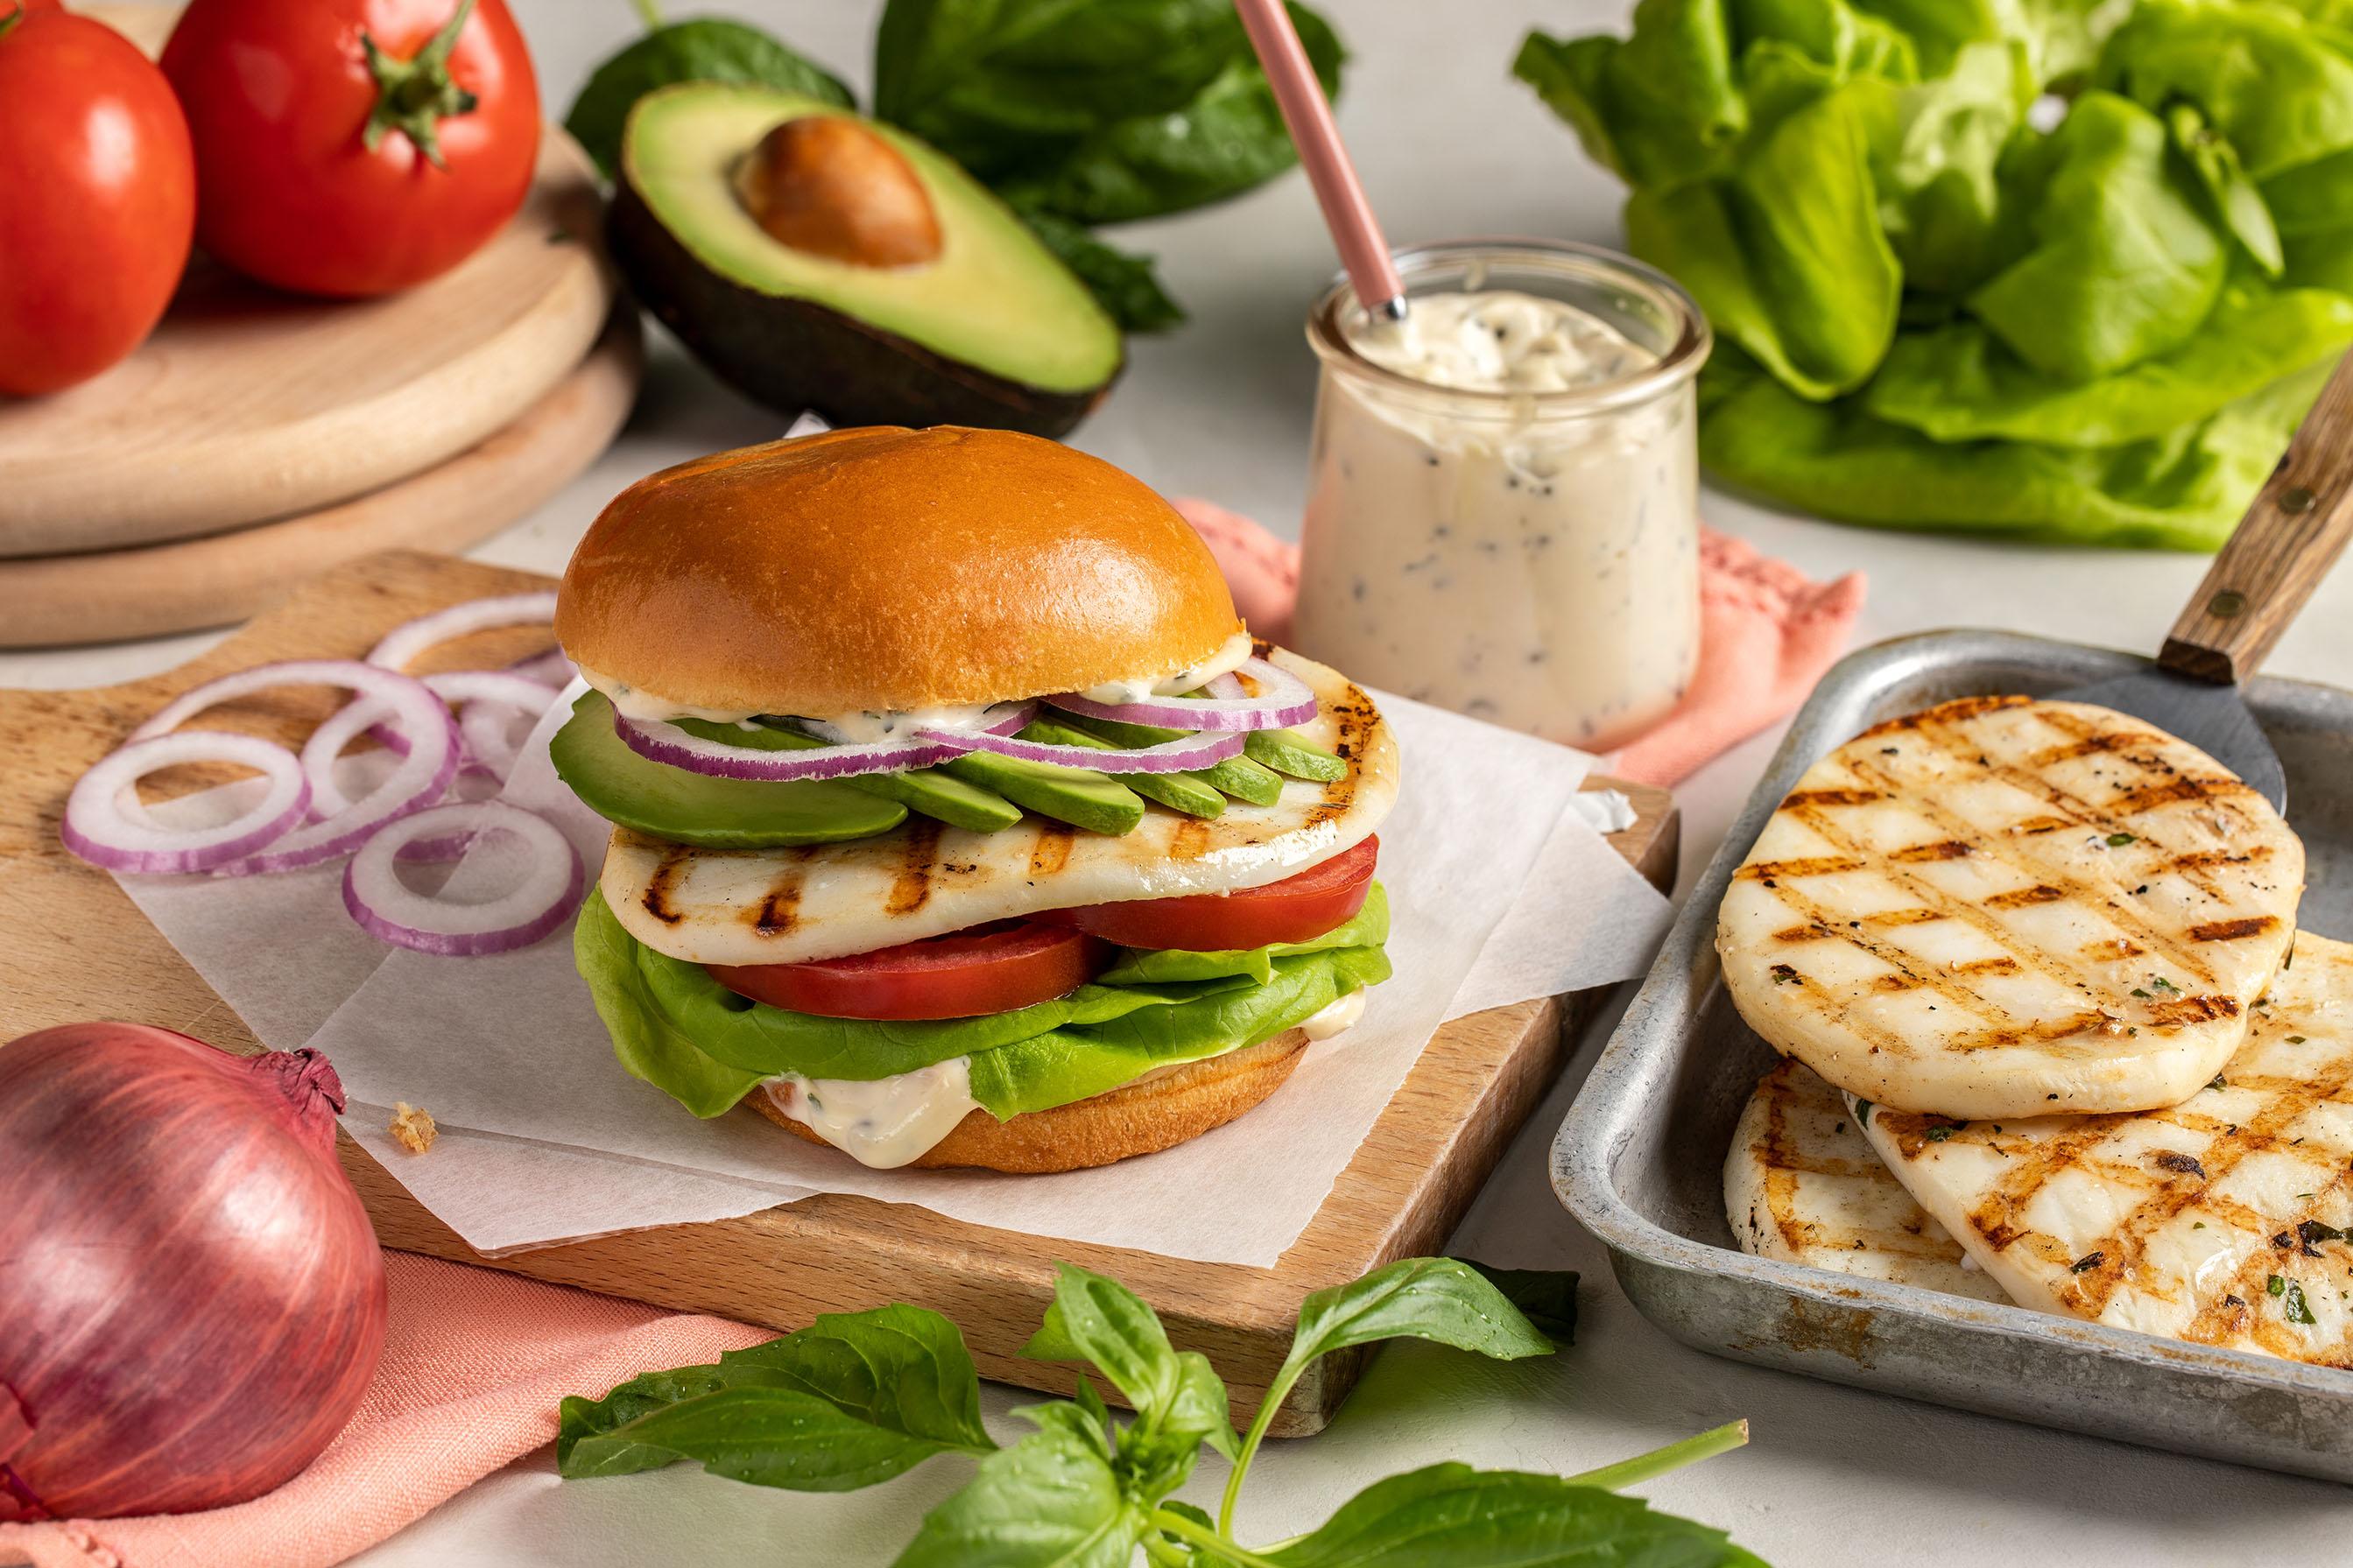 A Calamari Steak burger on a bun with lettuce, onions, avocado, tomato